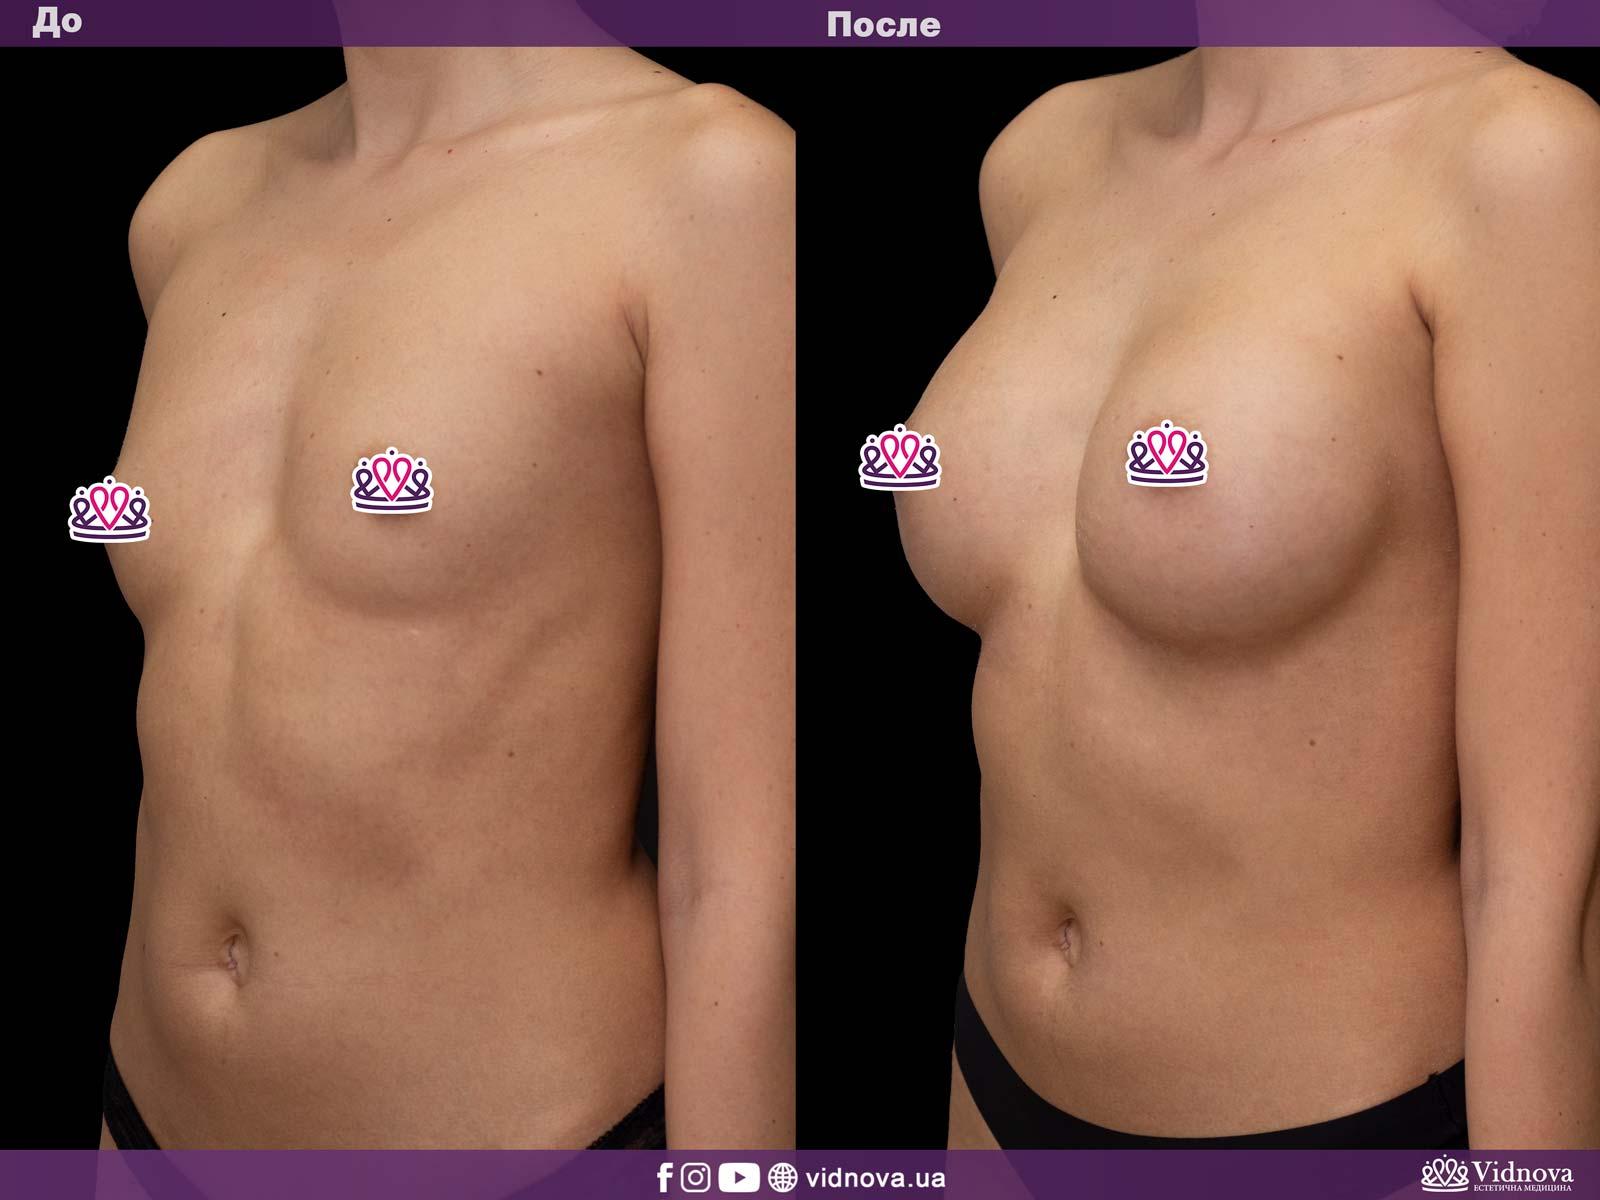 Увеличение груди: Фото ДО и ПОСЛЕ - Пример №20-2 - Клиника Vidnova